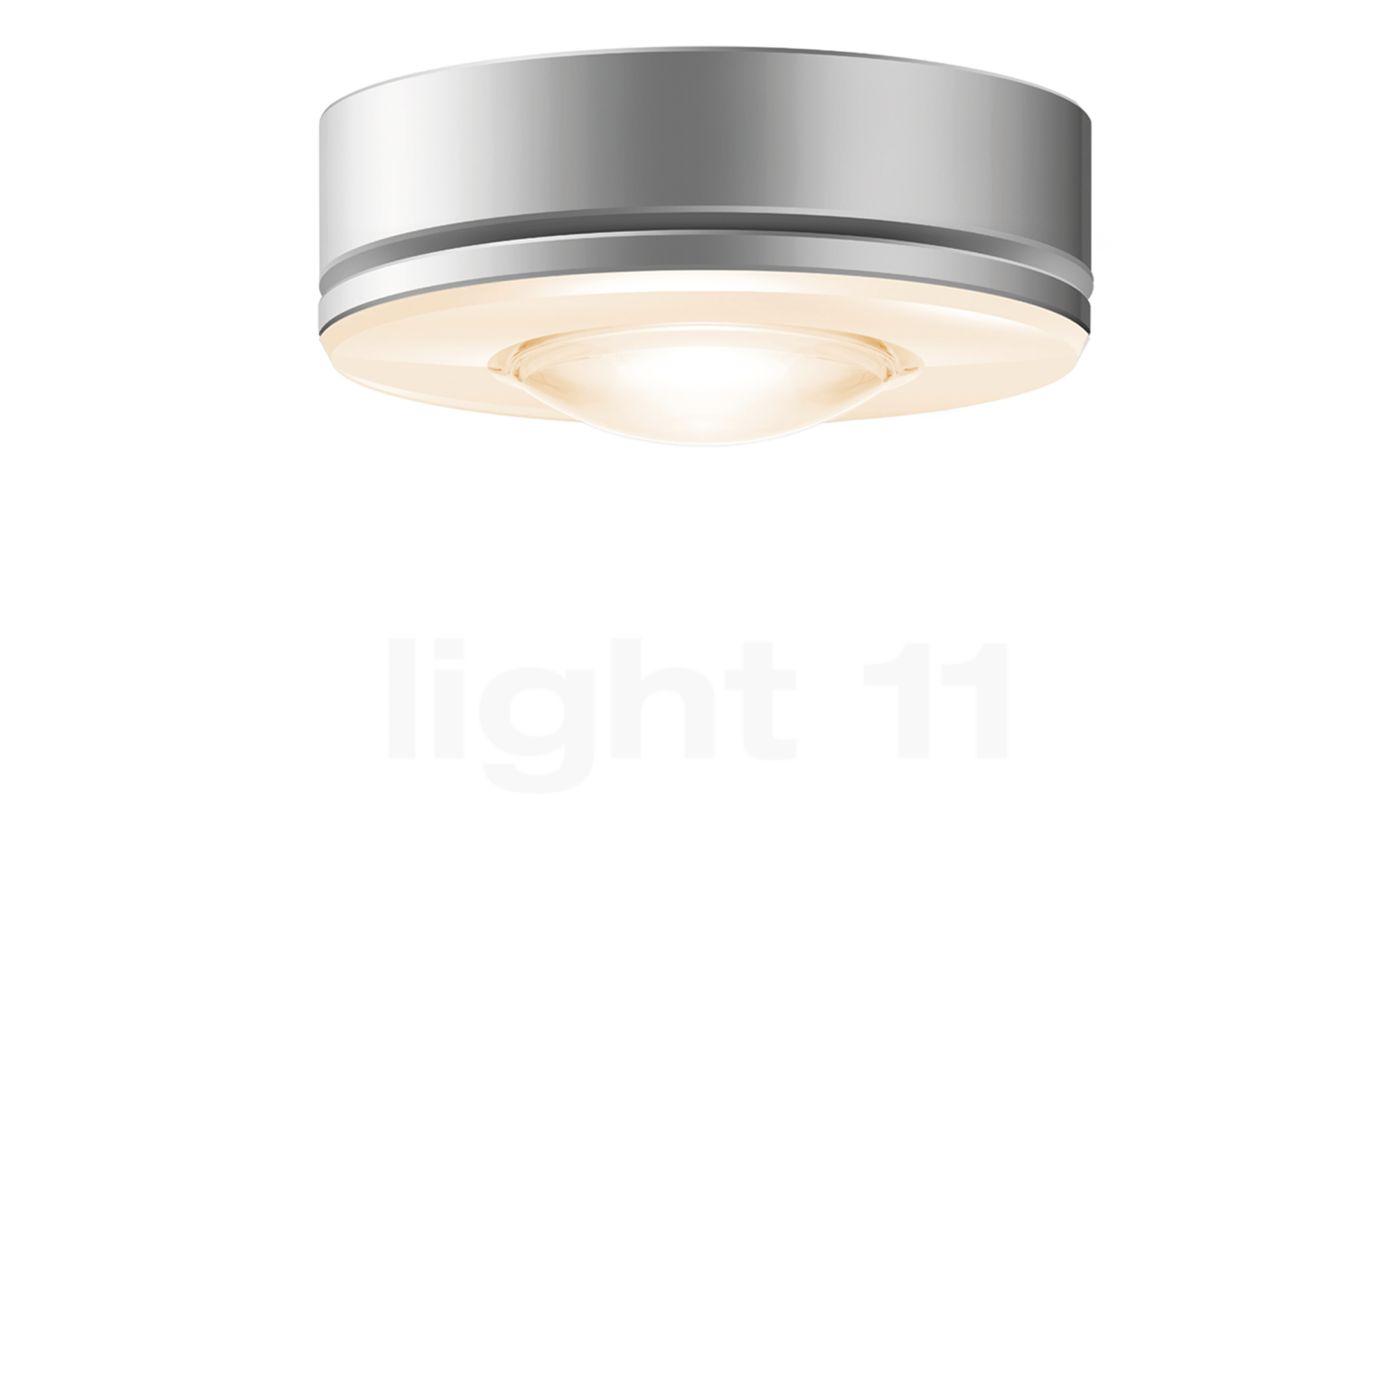 Bruck Euclid Deckenleuchte LED Niedervolt dim2warm, Chrom matt 100872mcgy-xw